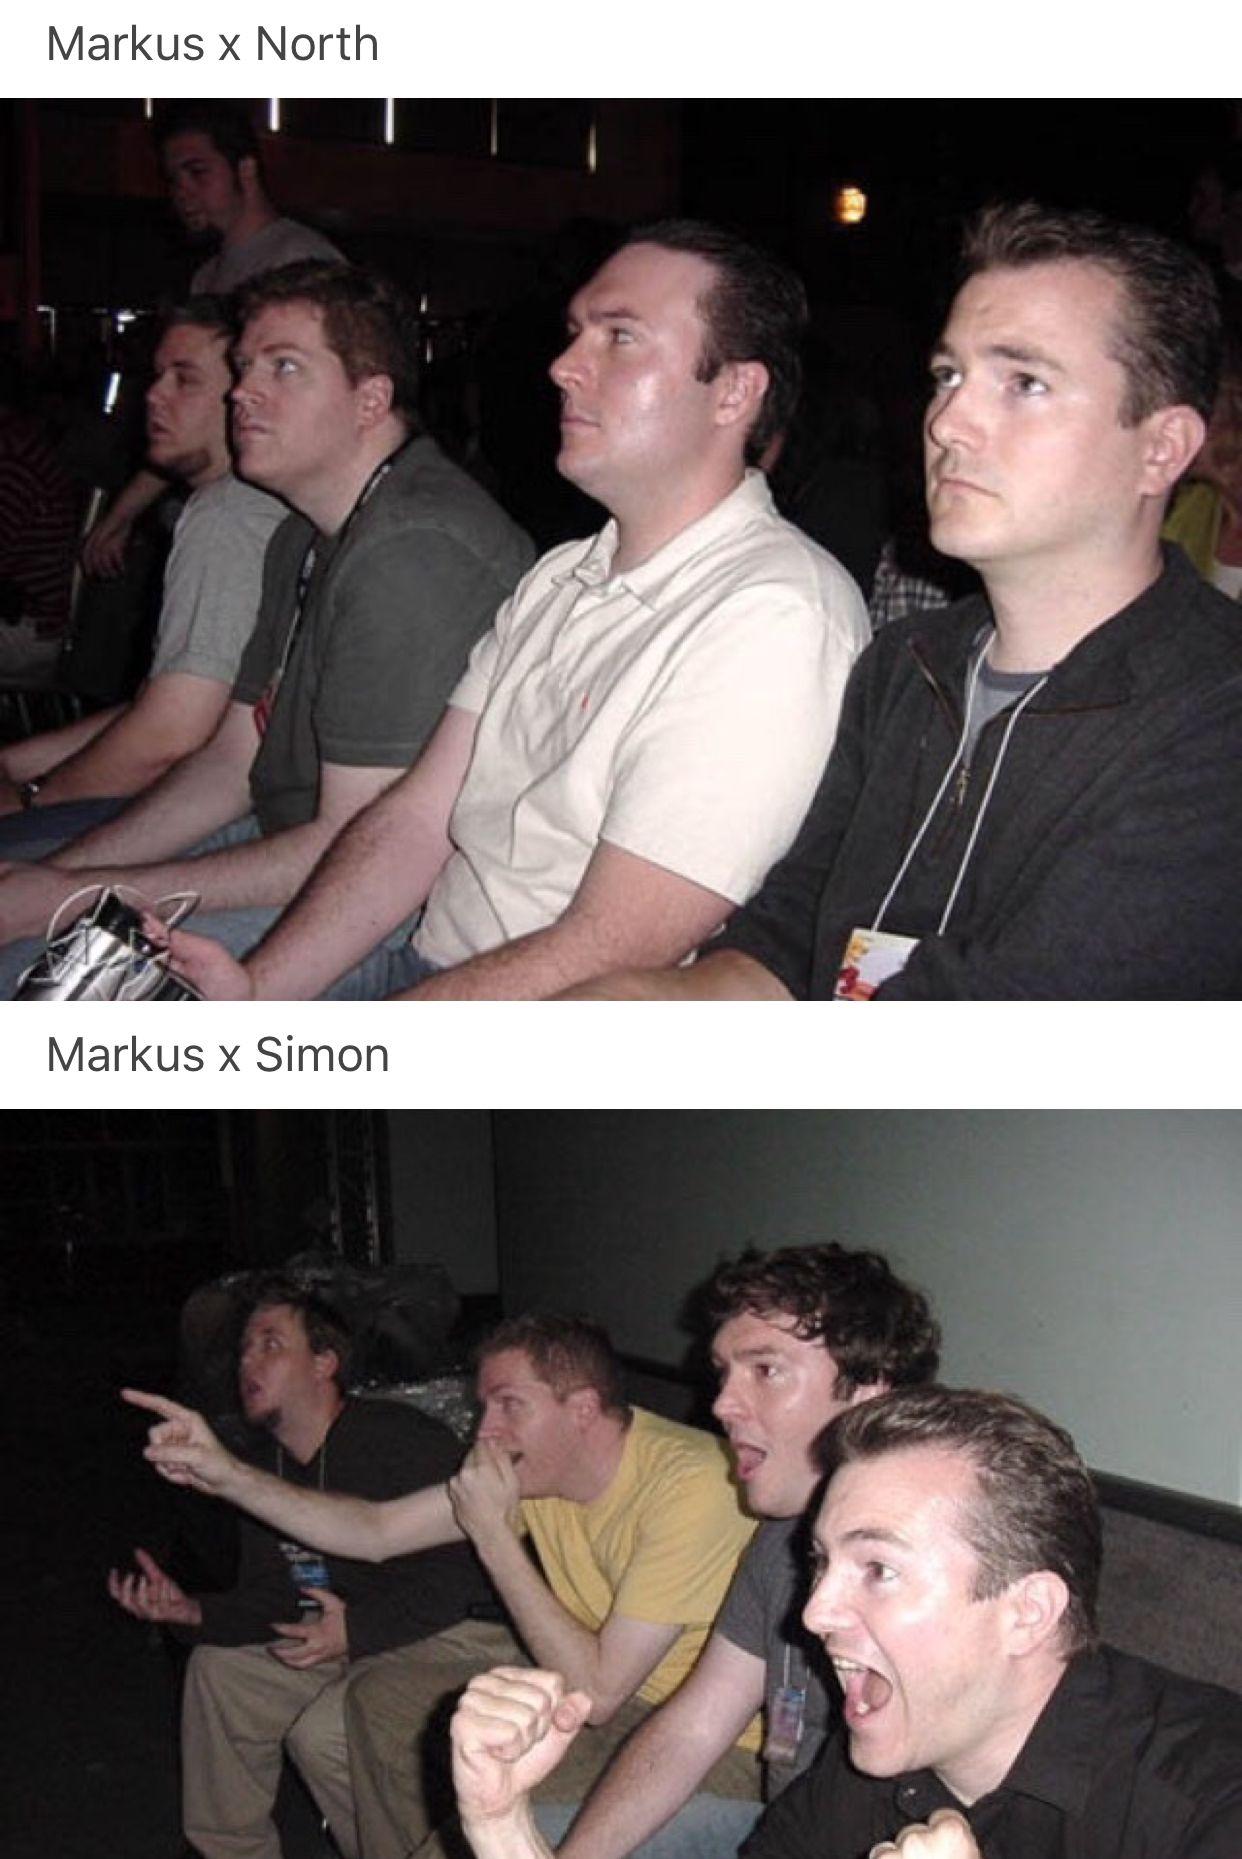 Detroit Become Human, Markus, North, Simon | Skit | Detroit become